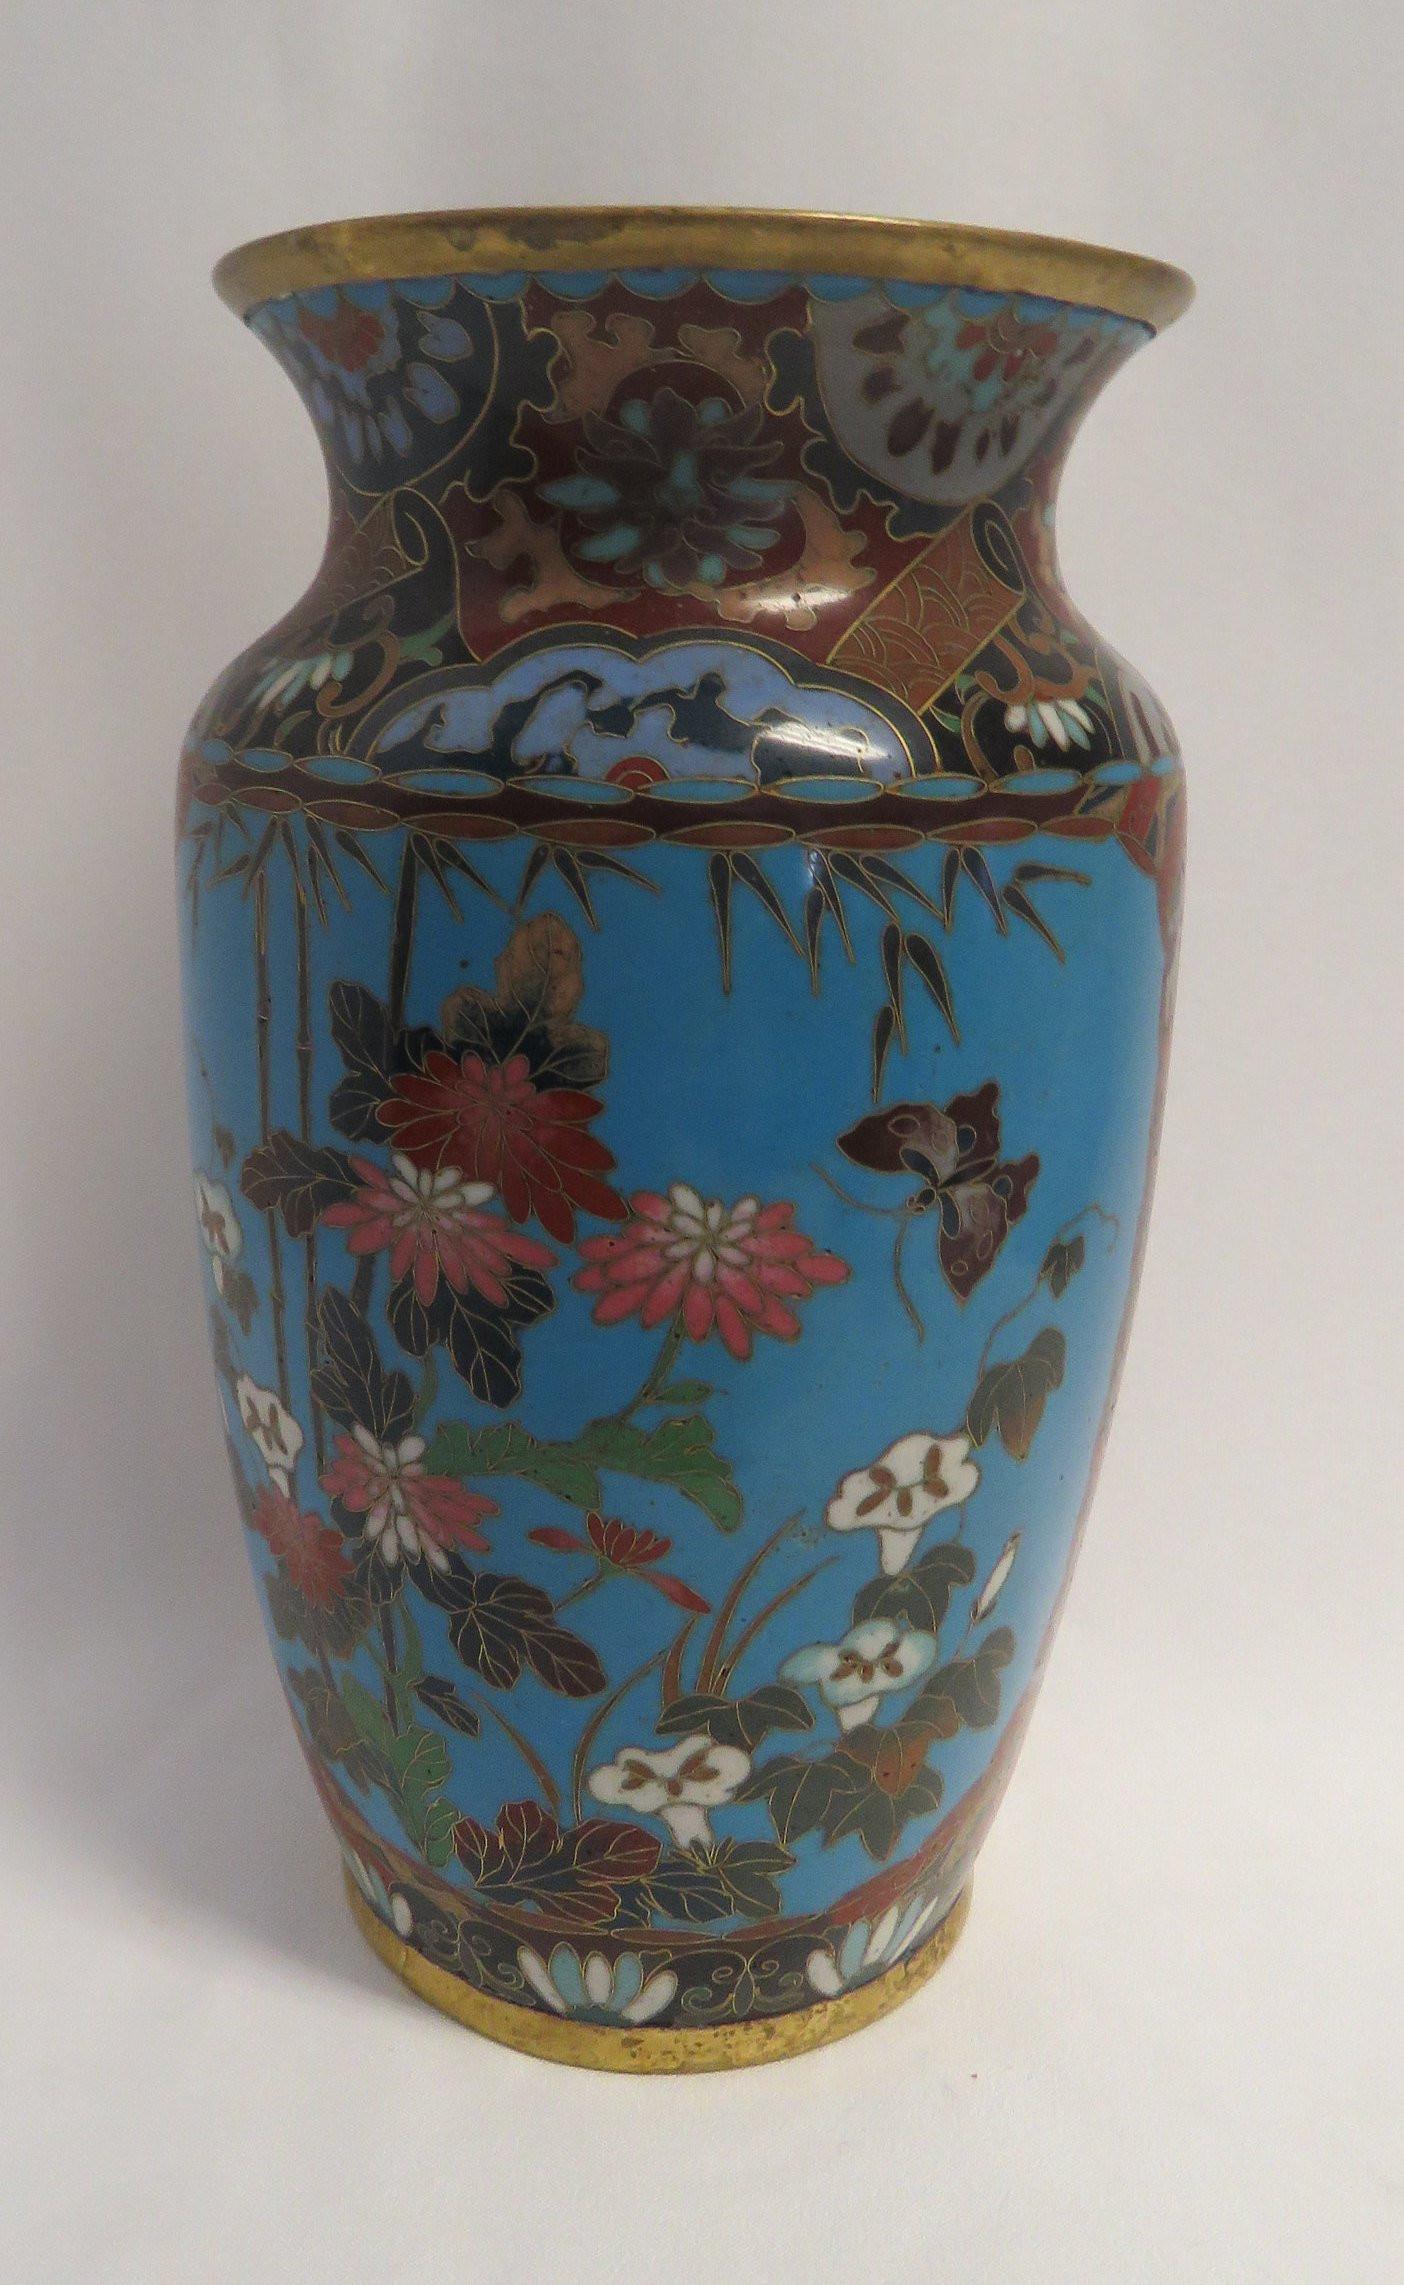 vintage japanese cloisonne vase of antique mejii period japanese blue ground w multi colored etsy within image 0